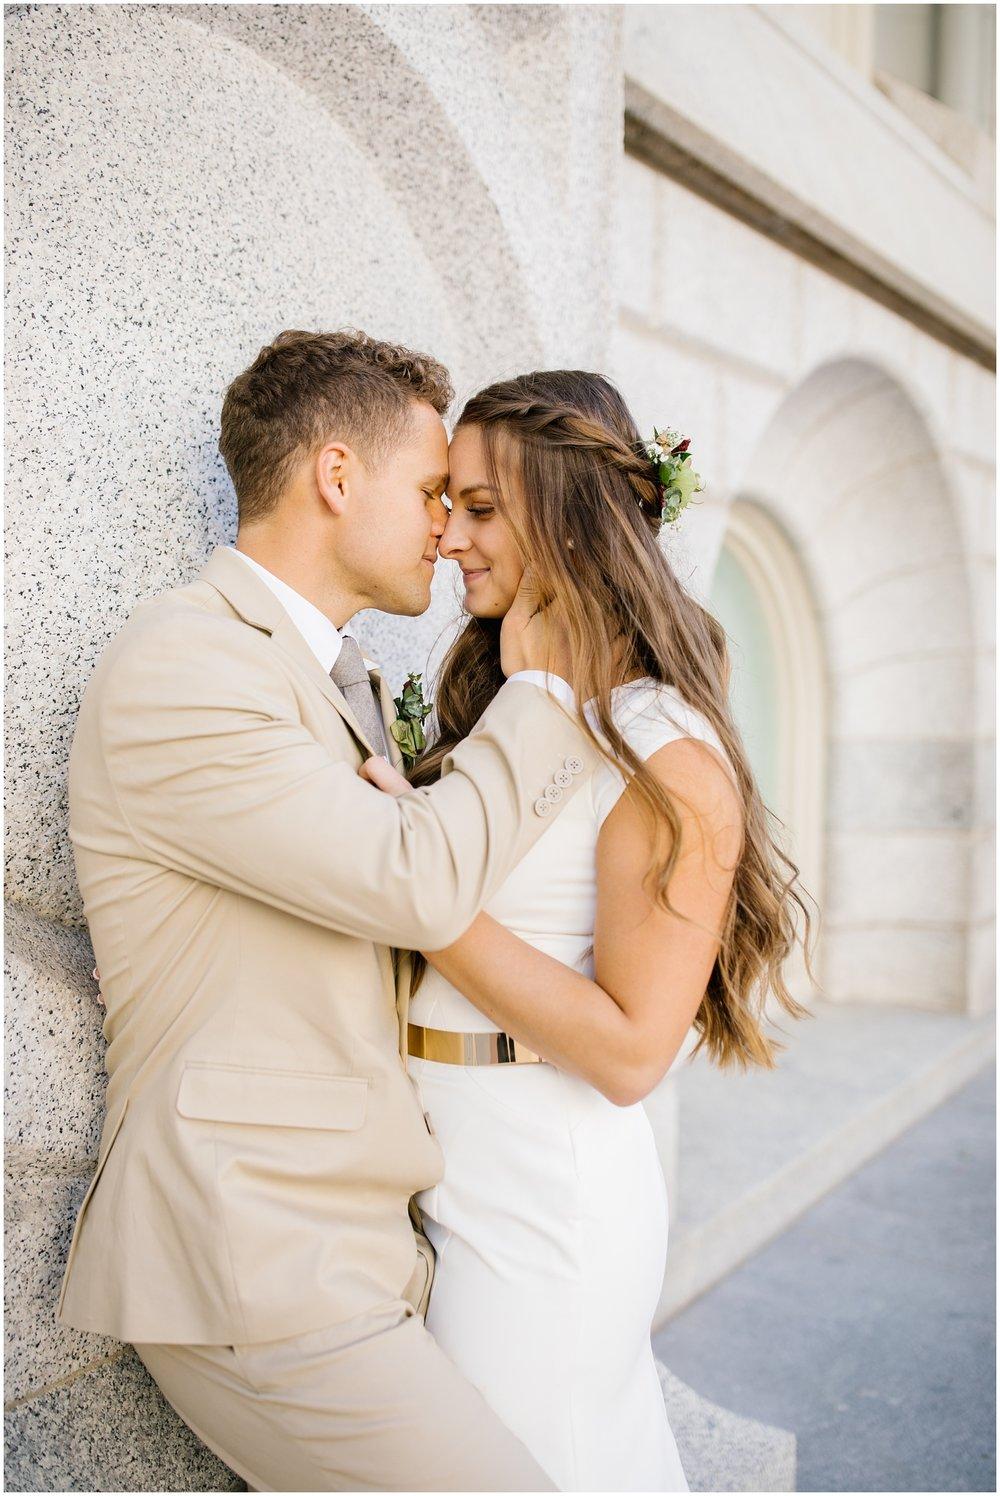 JC-Wedding-185_Lizzie-B-Imagery-Utah-Wedding-Photographer-Park-City-Salt-Lake-City-Temple-Joseph-Smith-Memorial-Building-Empire-Room.jpg